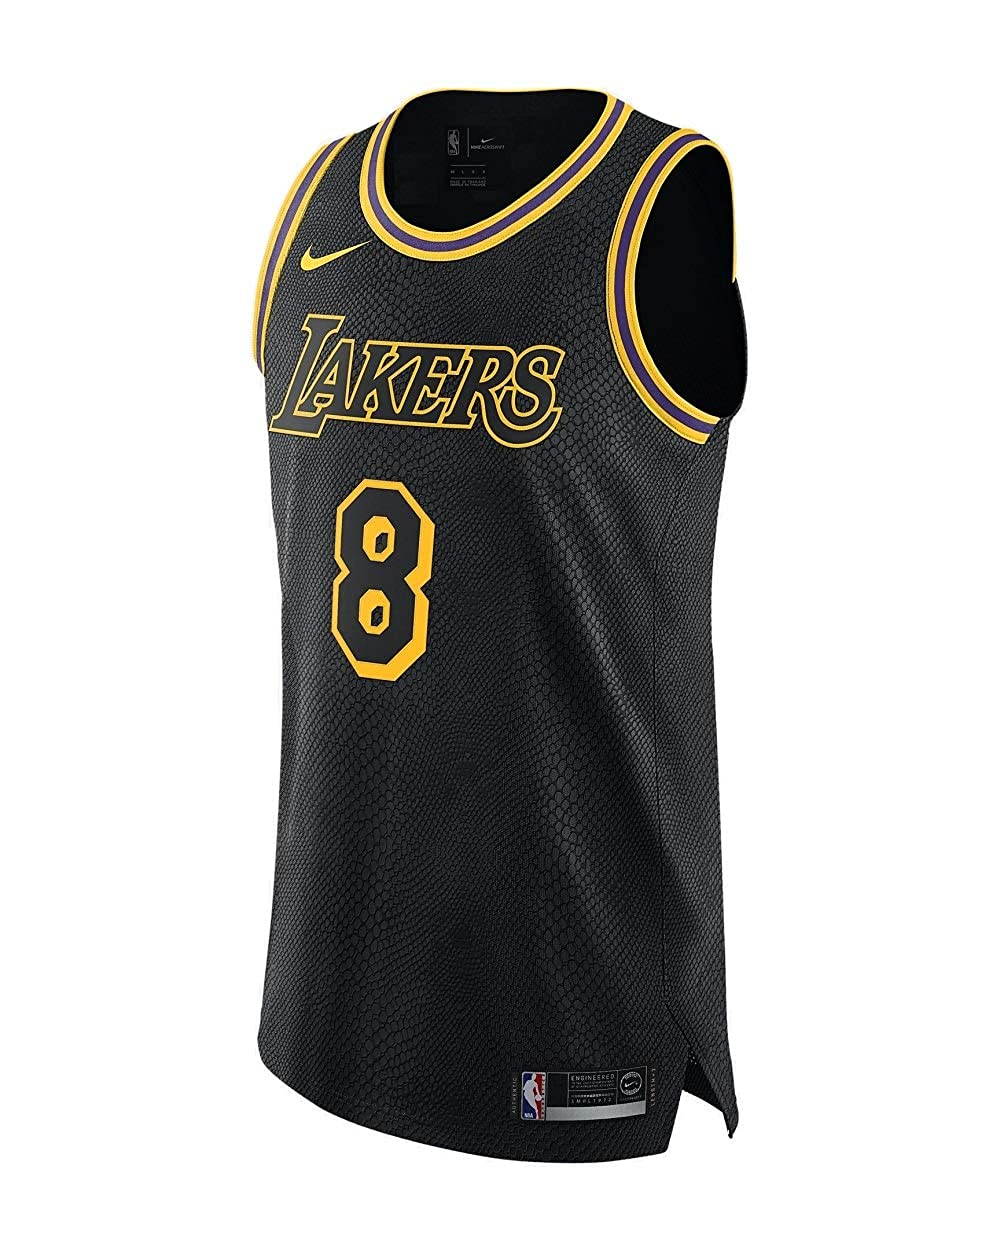 promo code b7335 70f03 Amazon.com: Nike Men Black Mamba Los Angeles Lakers Kobe ...